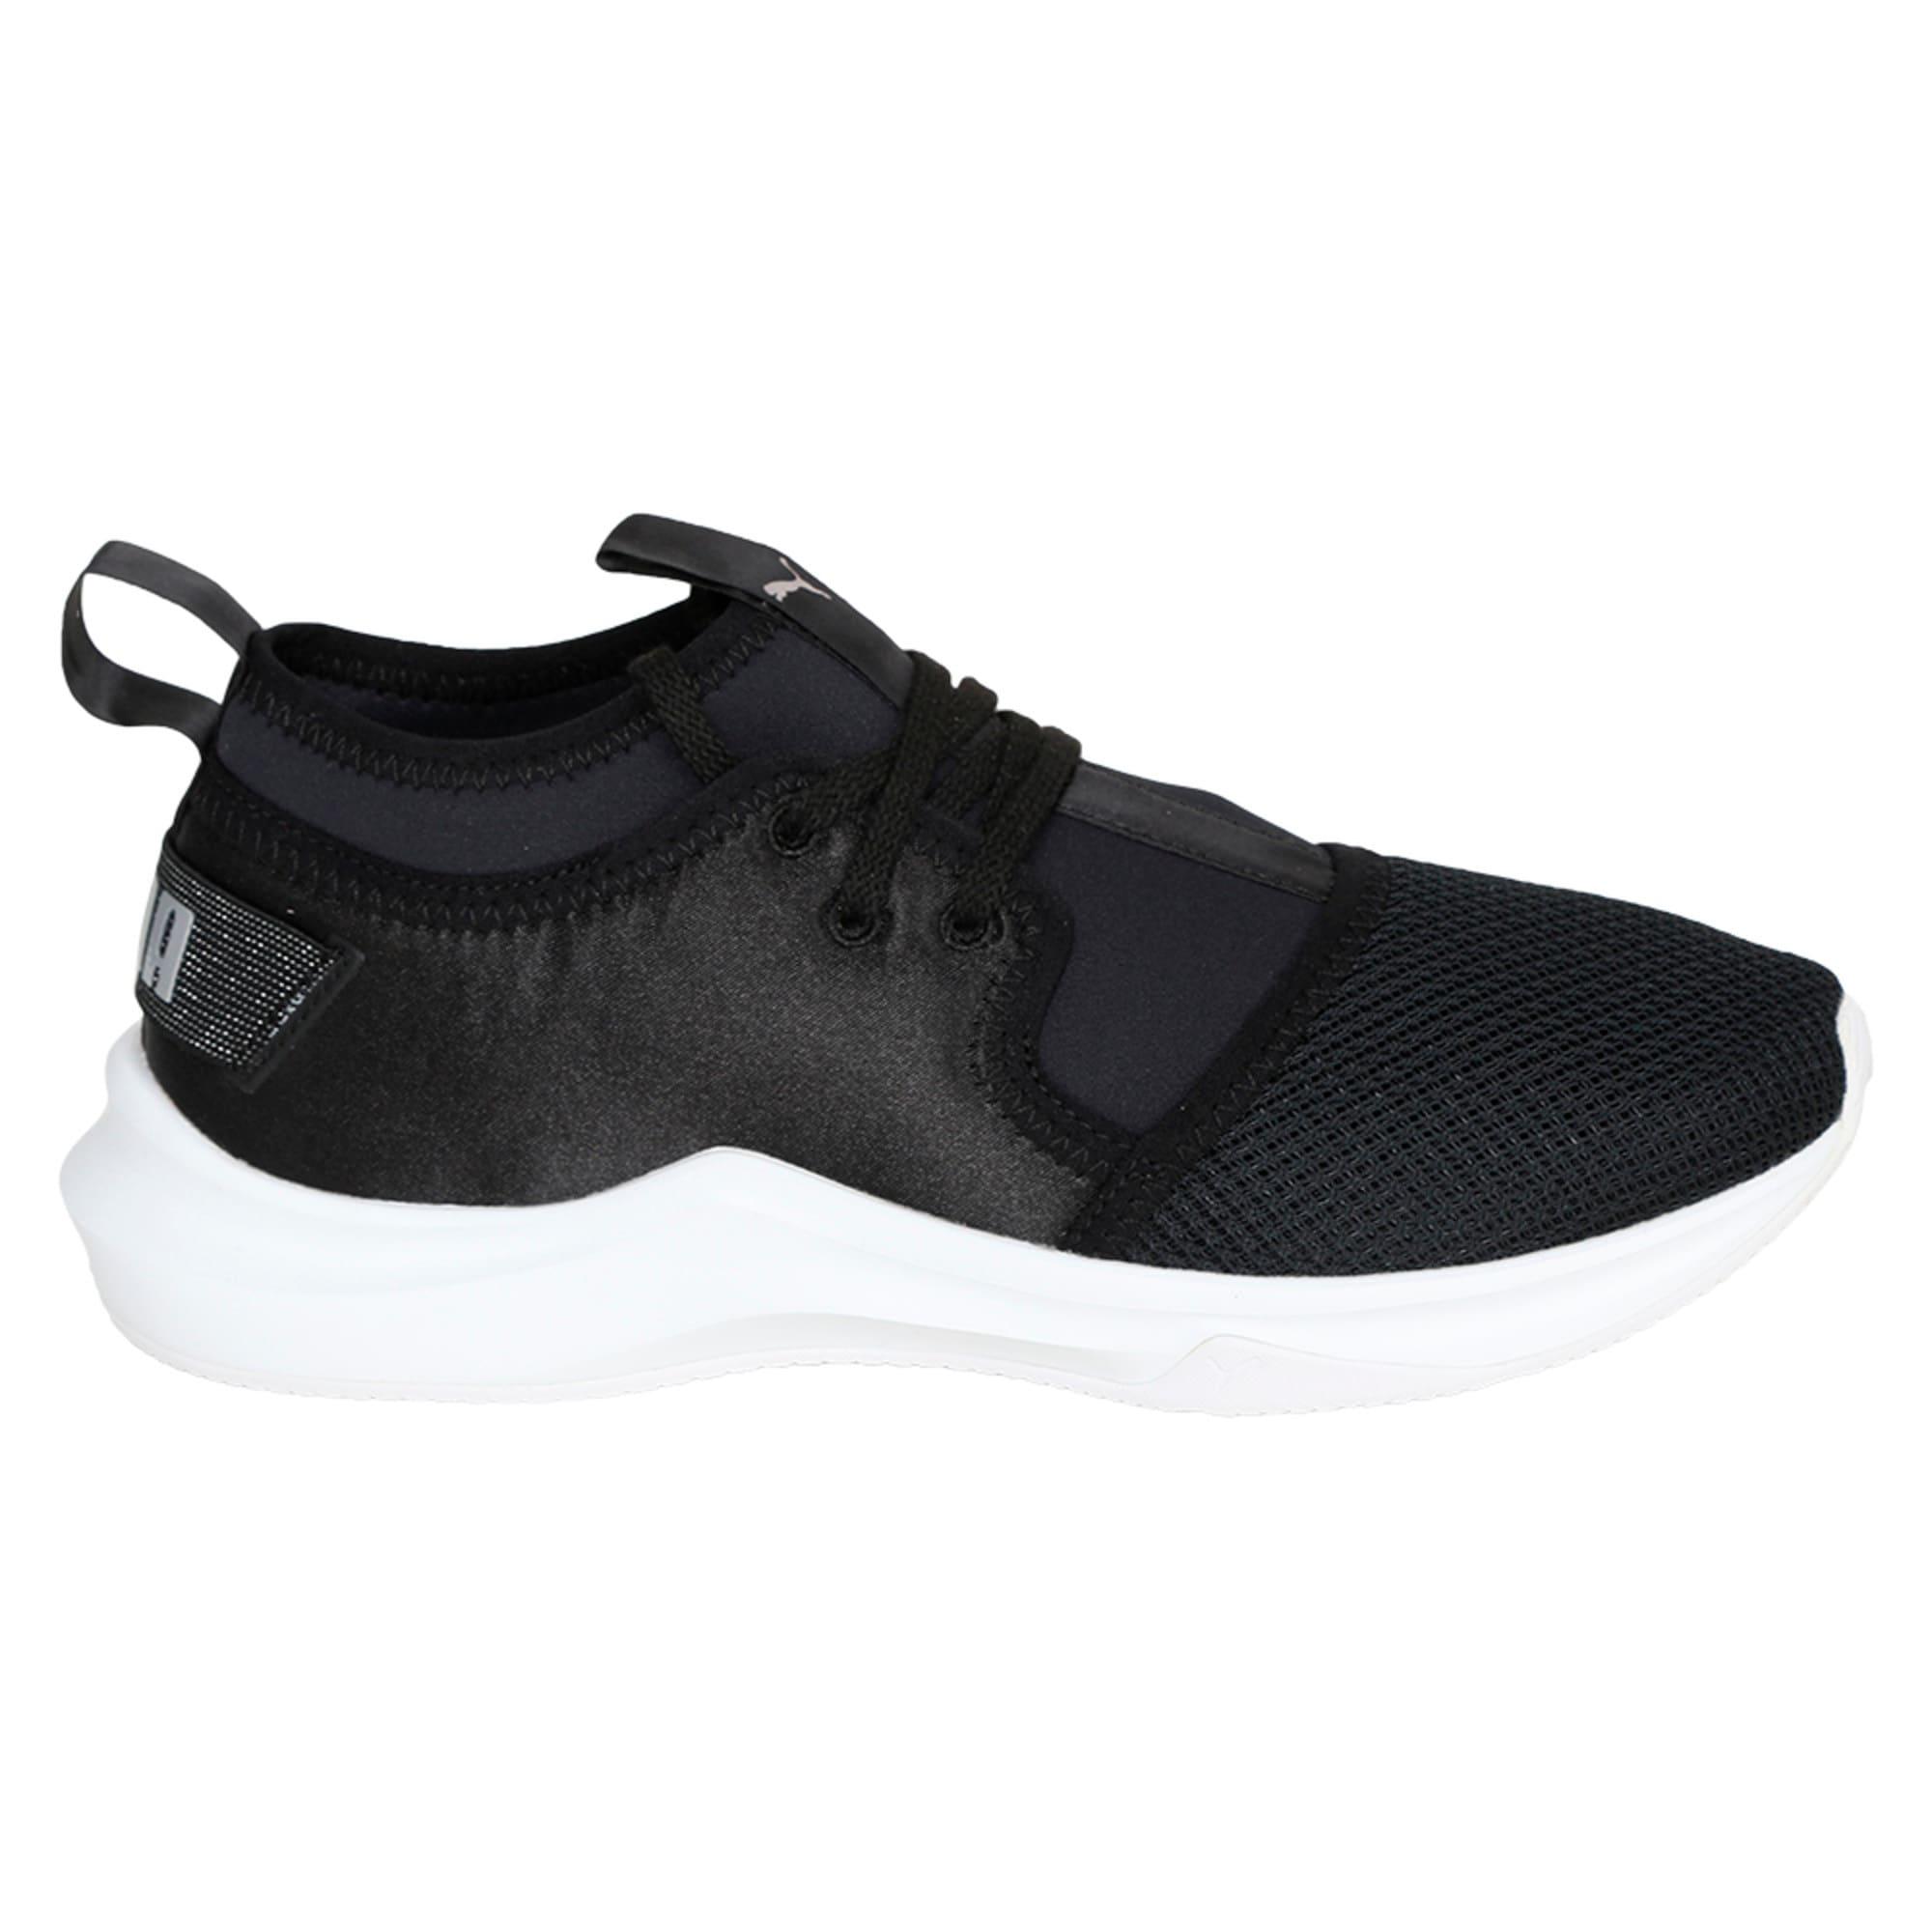 Thumbnail 5 of Phenom Satin Lo En Pointe Women's Training Shoes, Puma Black-Puma White, medium-IND